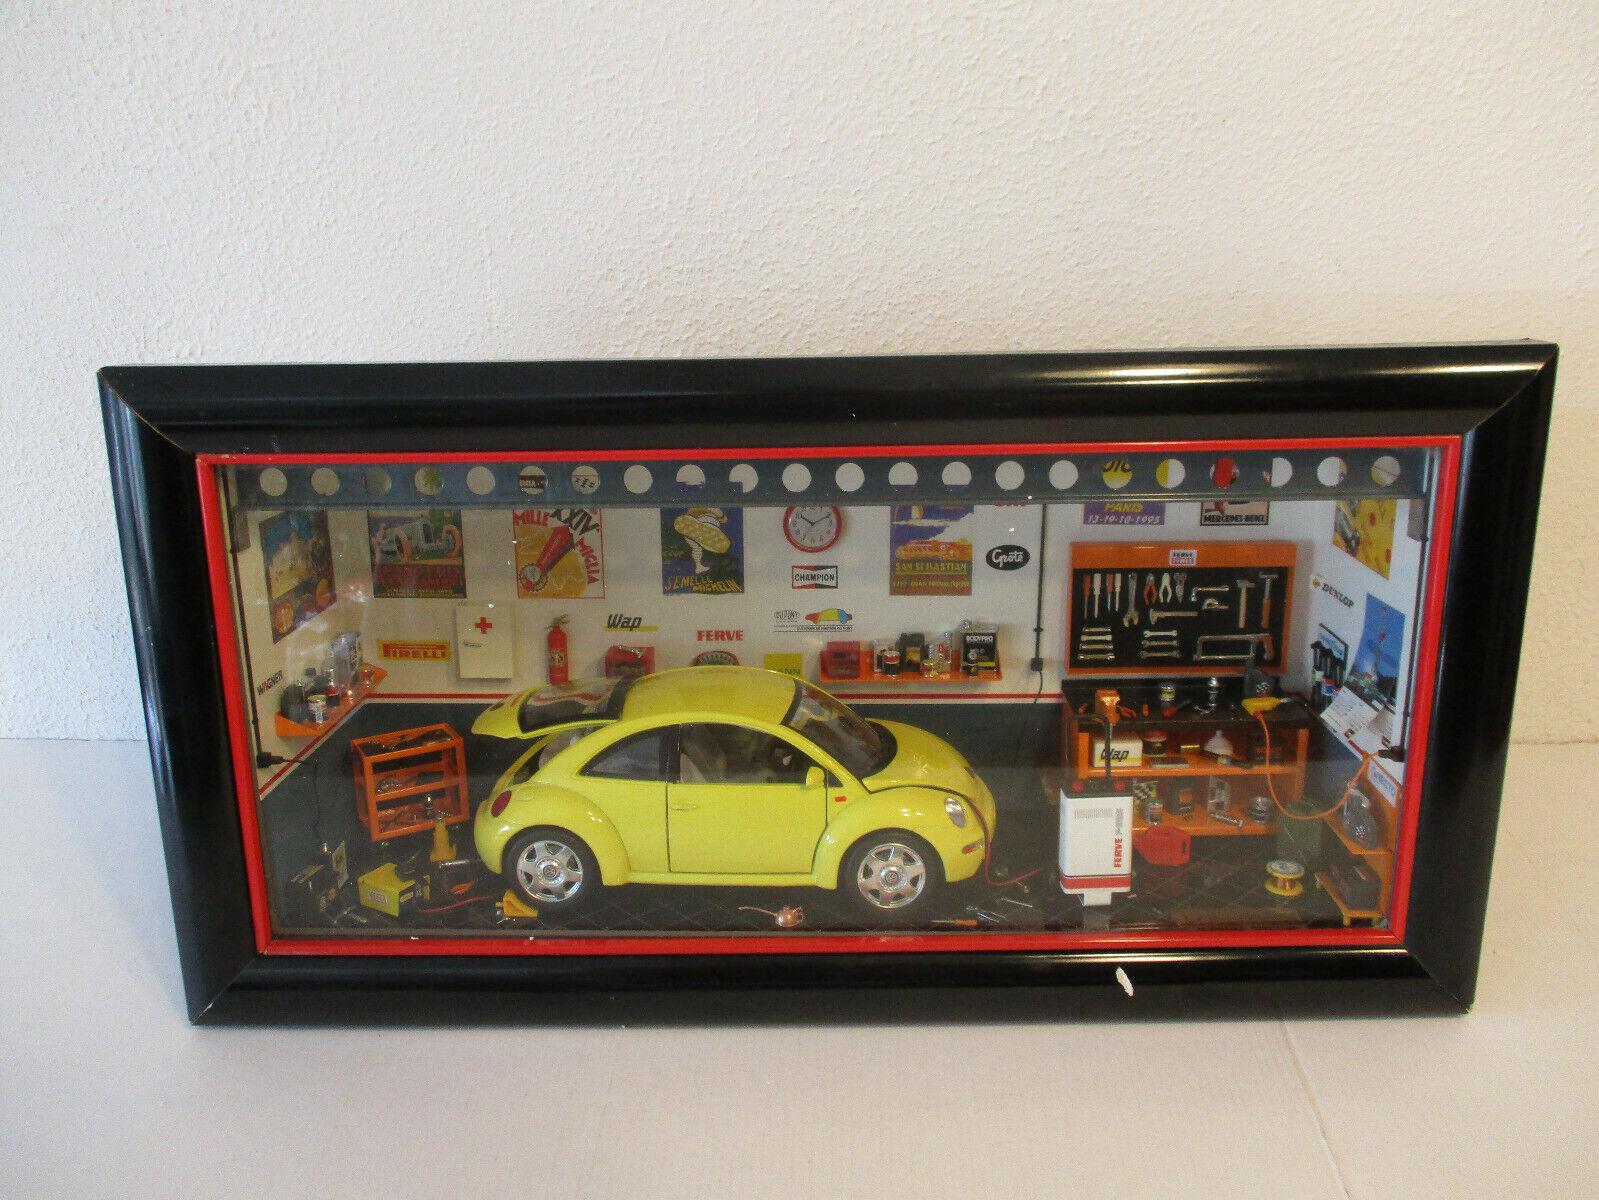 (GOKR) Ferrets Mini Model Diorama VW Volkswagen New Beetle 1   18